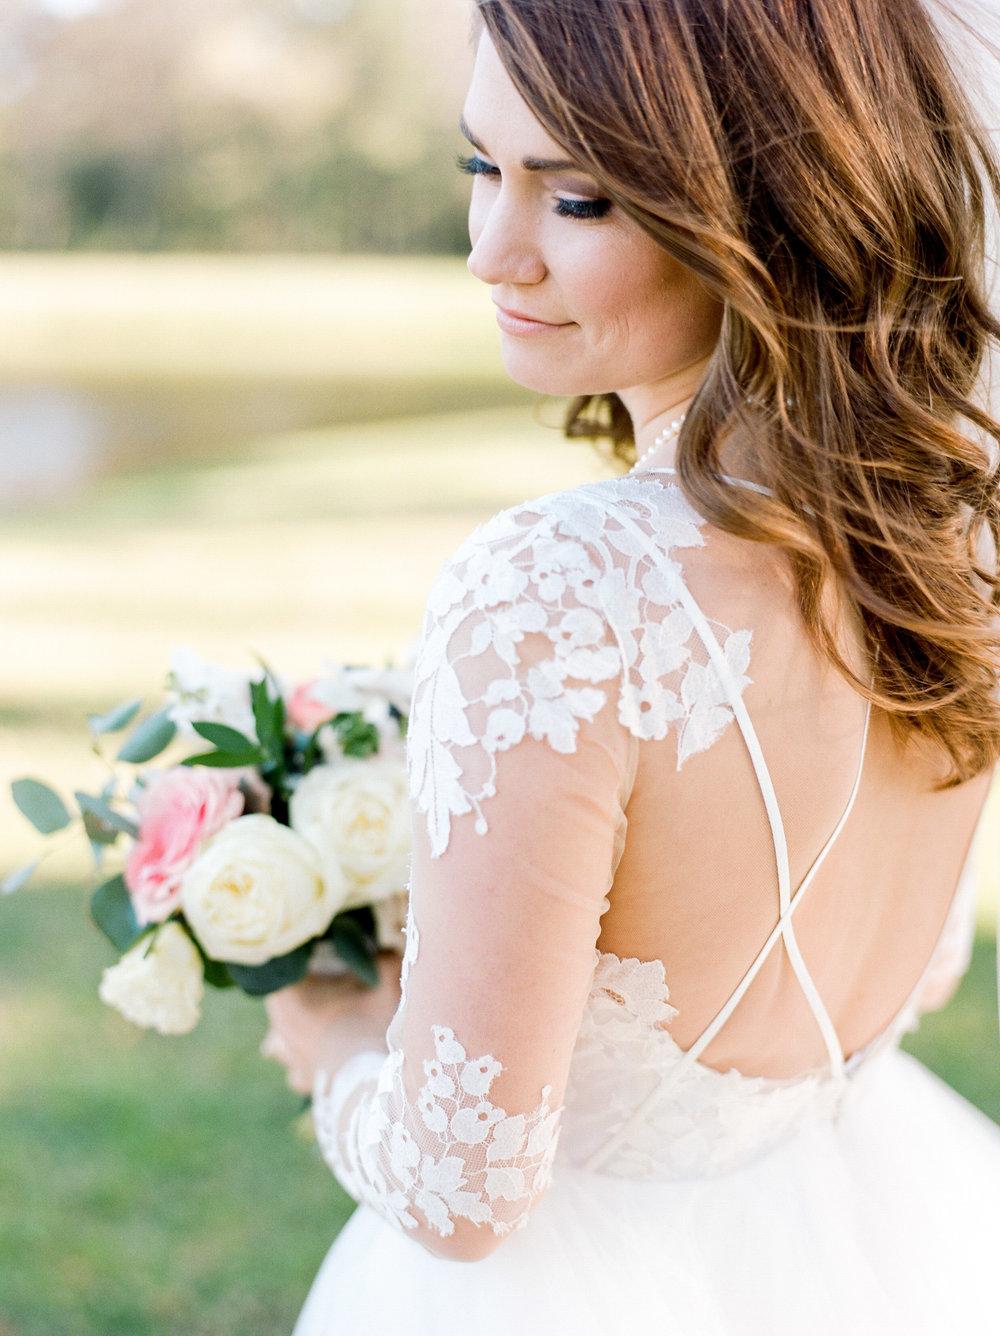 Houston-Wedding-Photographer-Style-Me-Pretty-St-Anne-Catholic-Church-Wedding-The-Woodlands-Country-Club-Palmer-Course-Austin-Wedding-photographer-fine-art-film-17.jpg